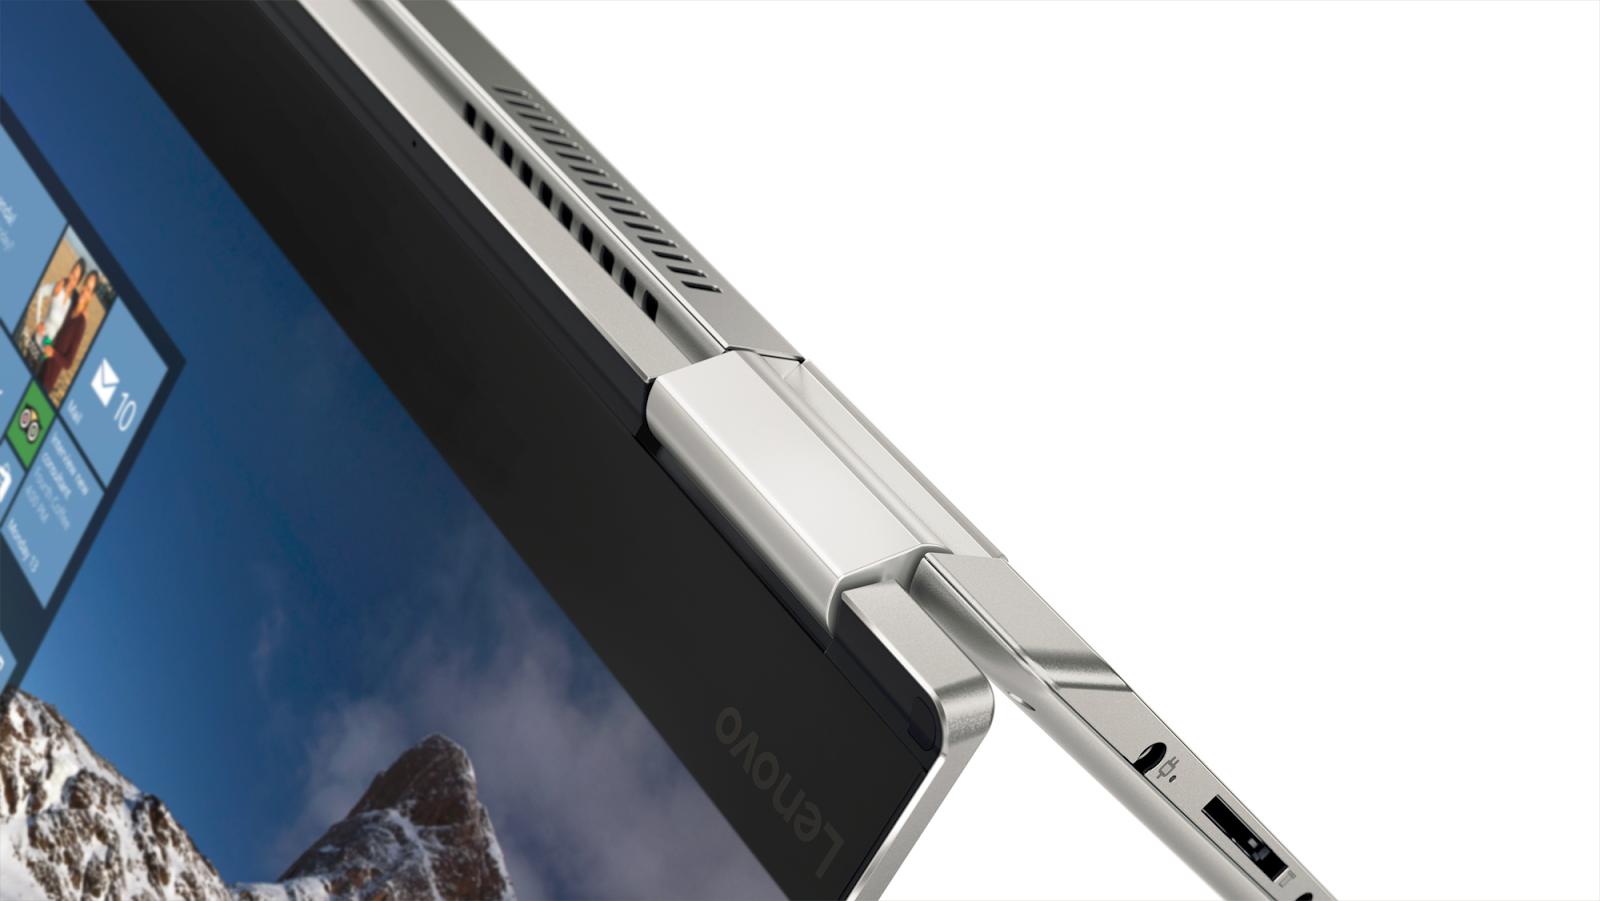 Зачем Lenovo установила Wi-Fi-модуль в шарнир ноутбука? - 4